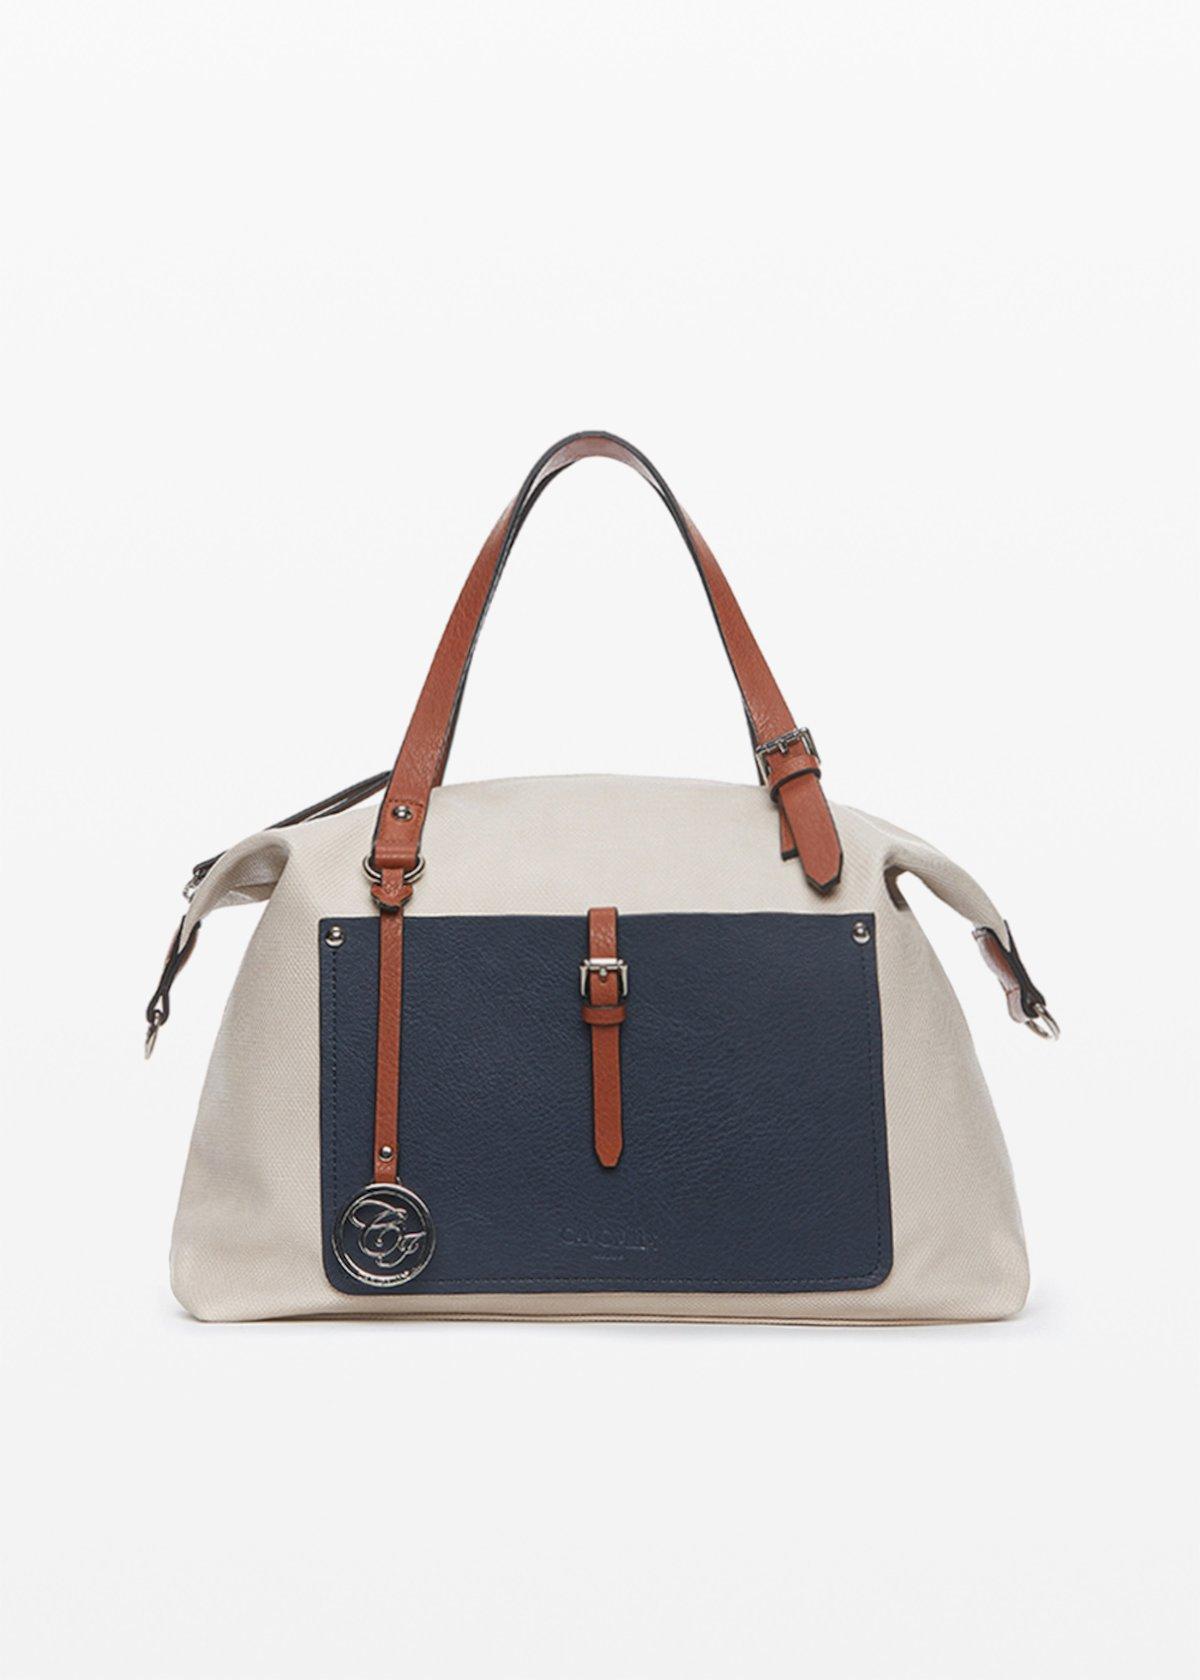 Faux leather Brenda handbag with front pocket - Light Beige /  Medium Blue - Woman - Category image